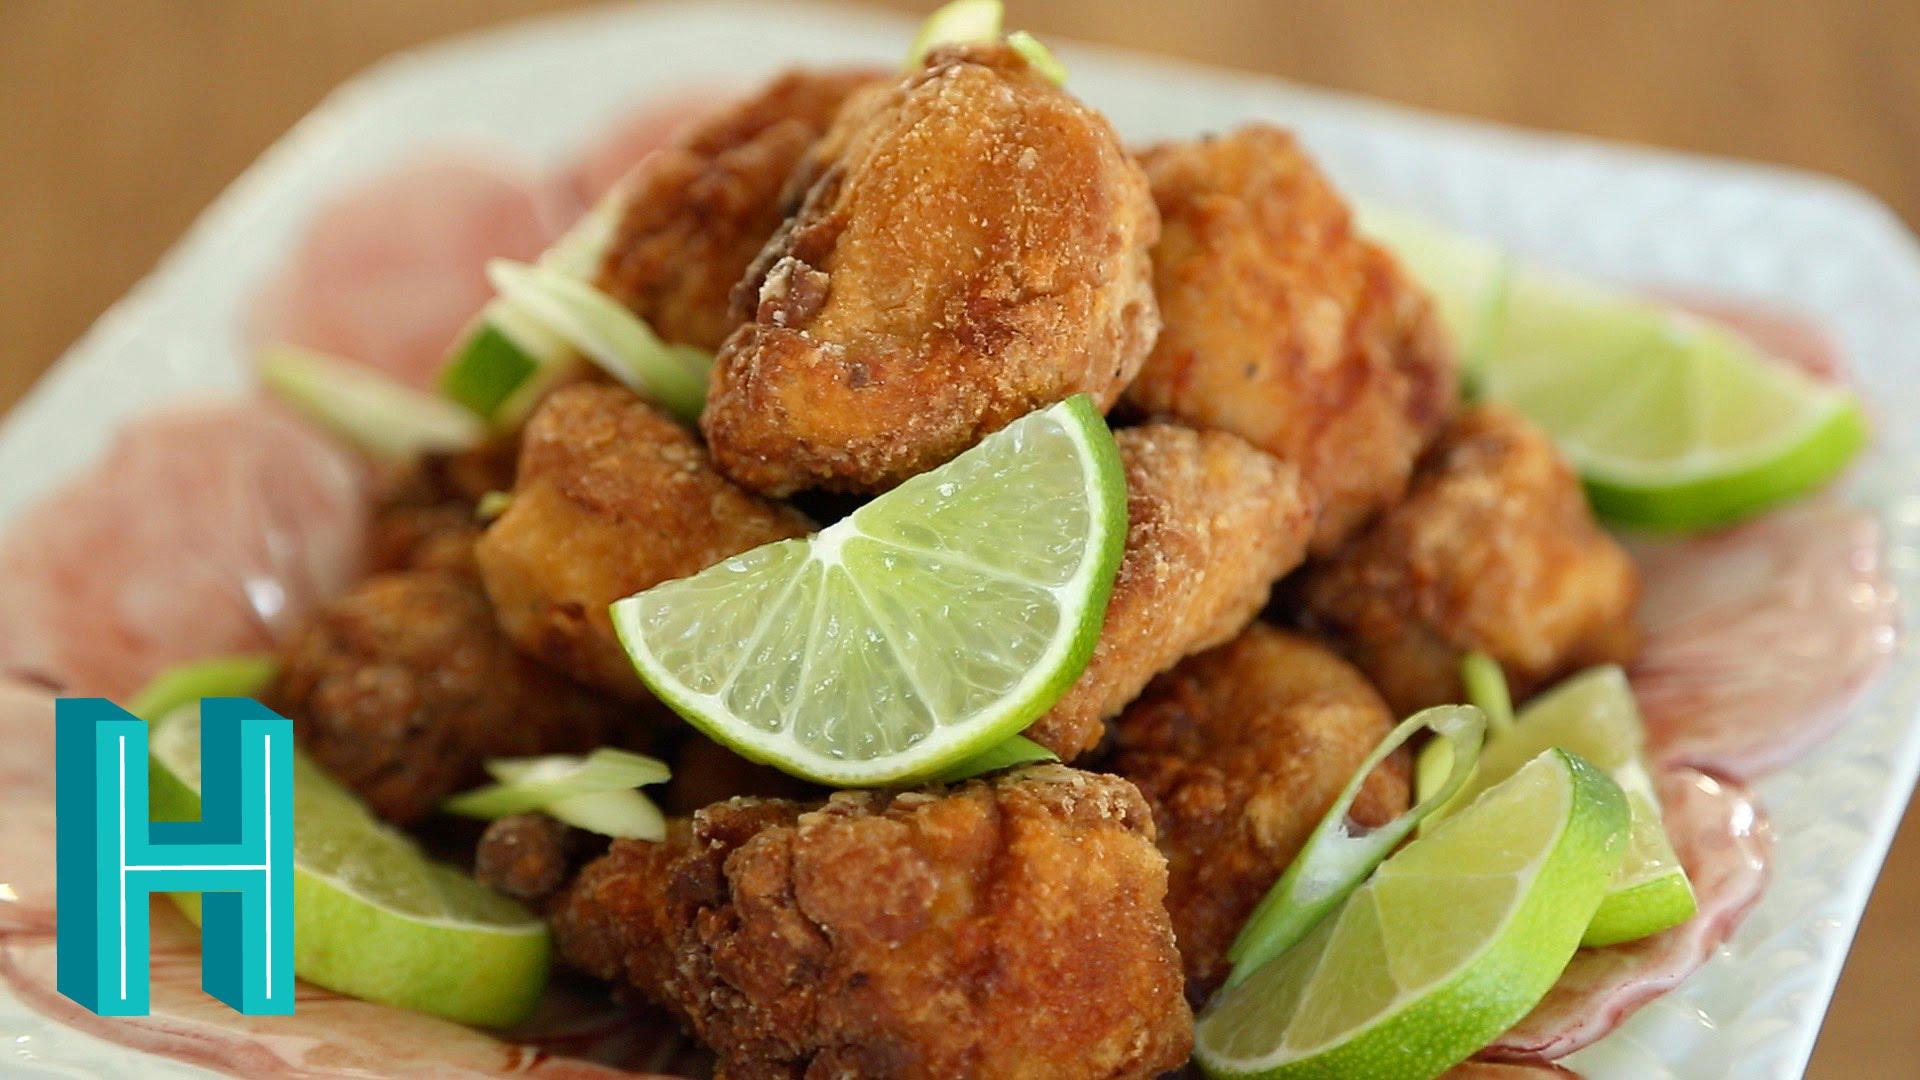 Ginger Fried Chicken